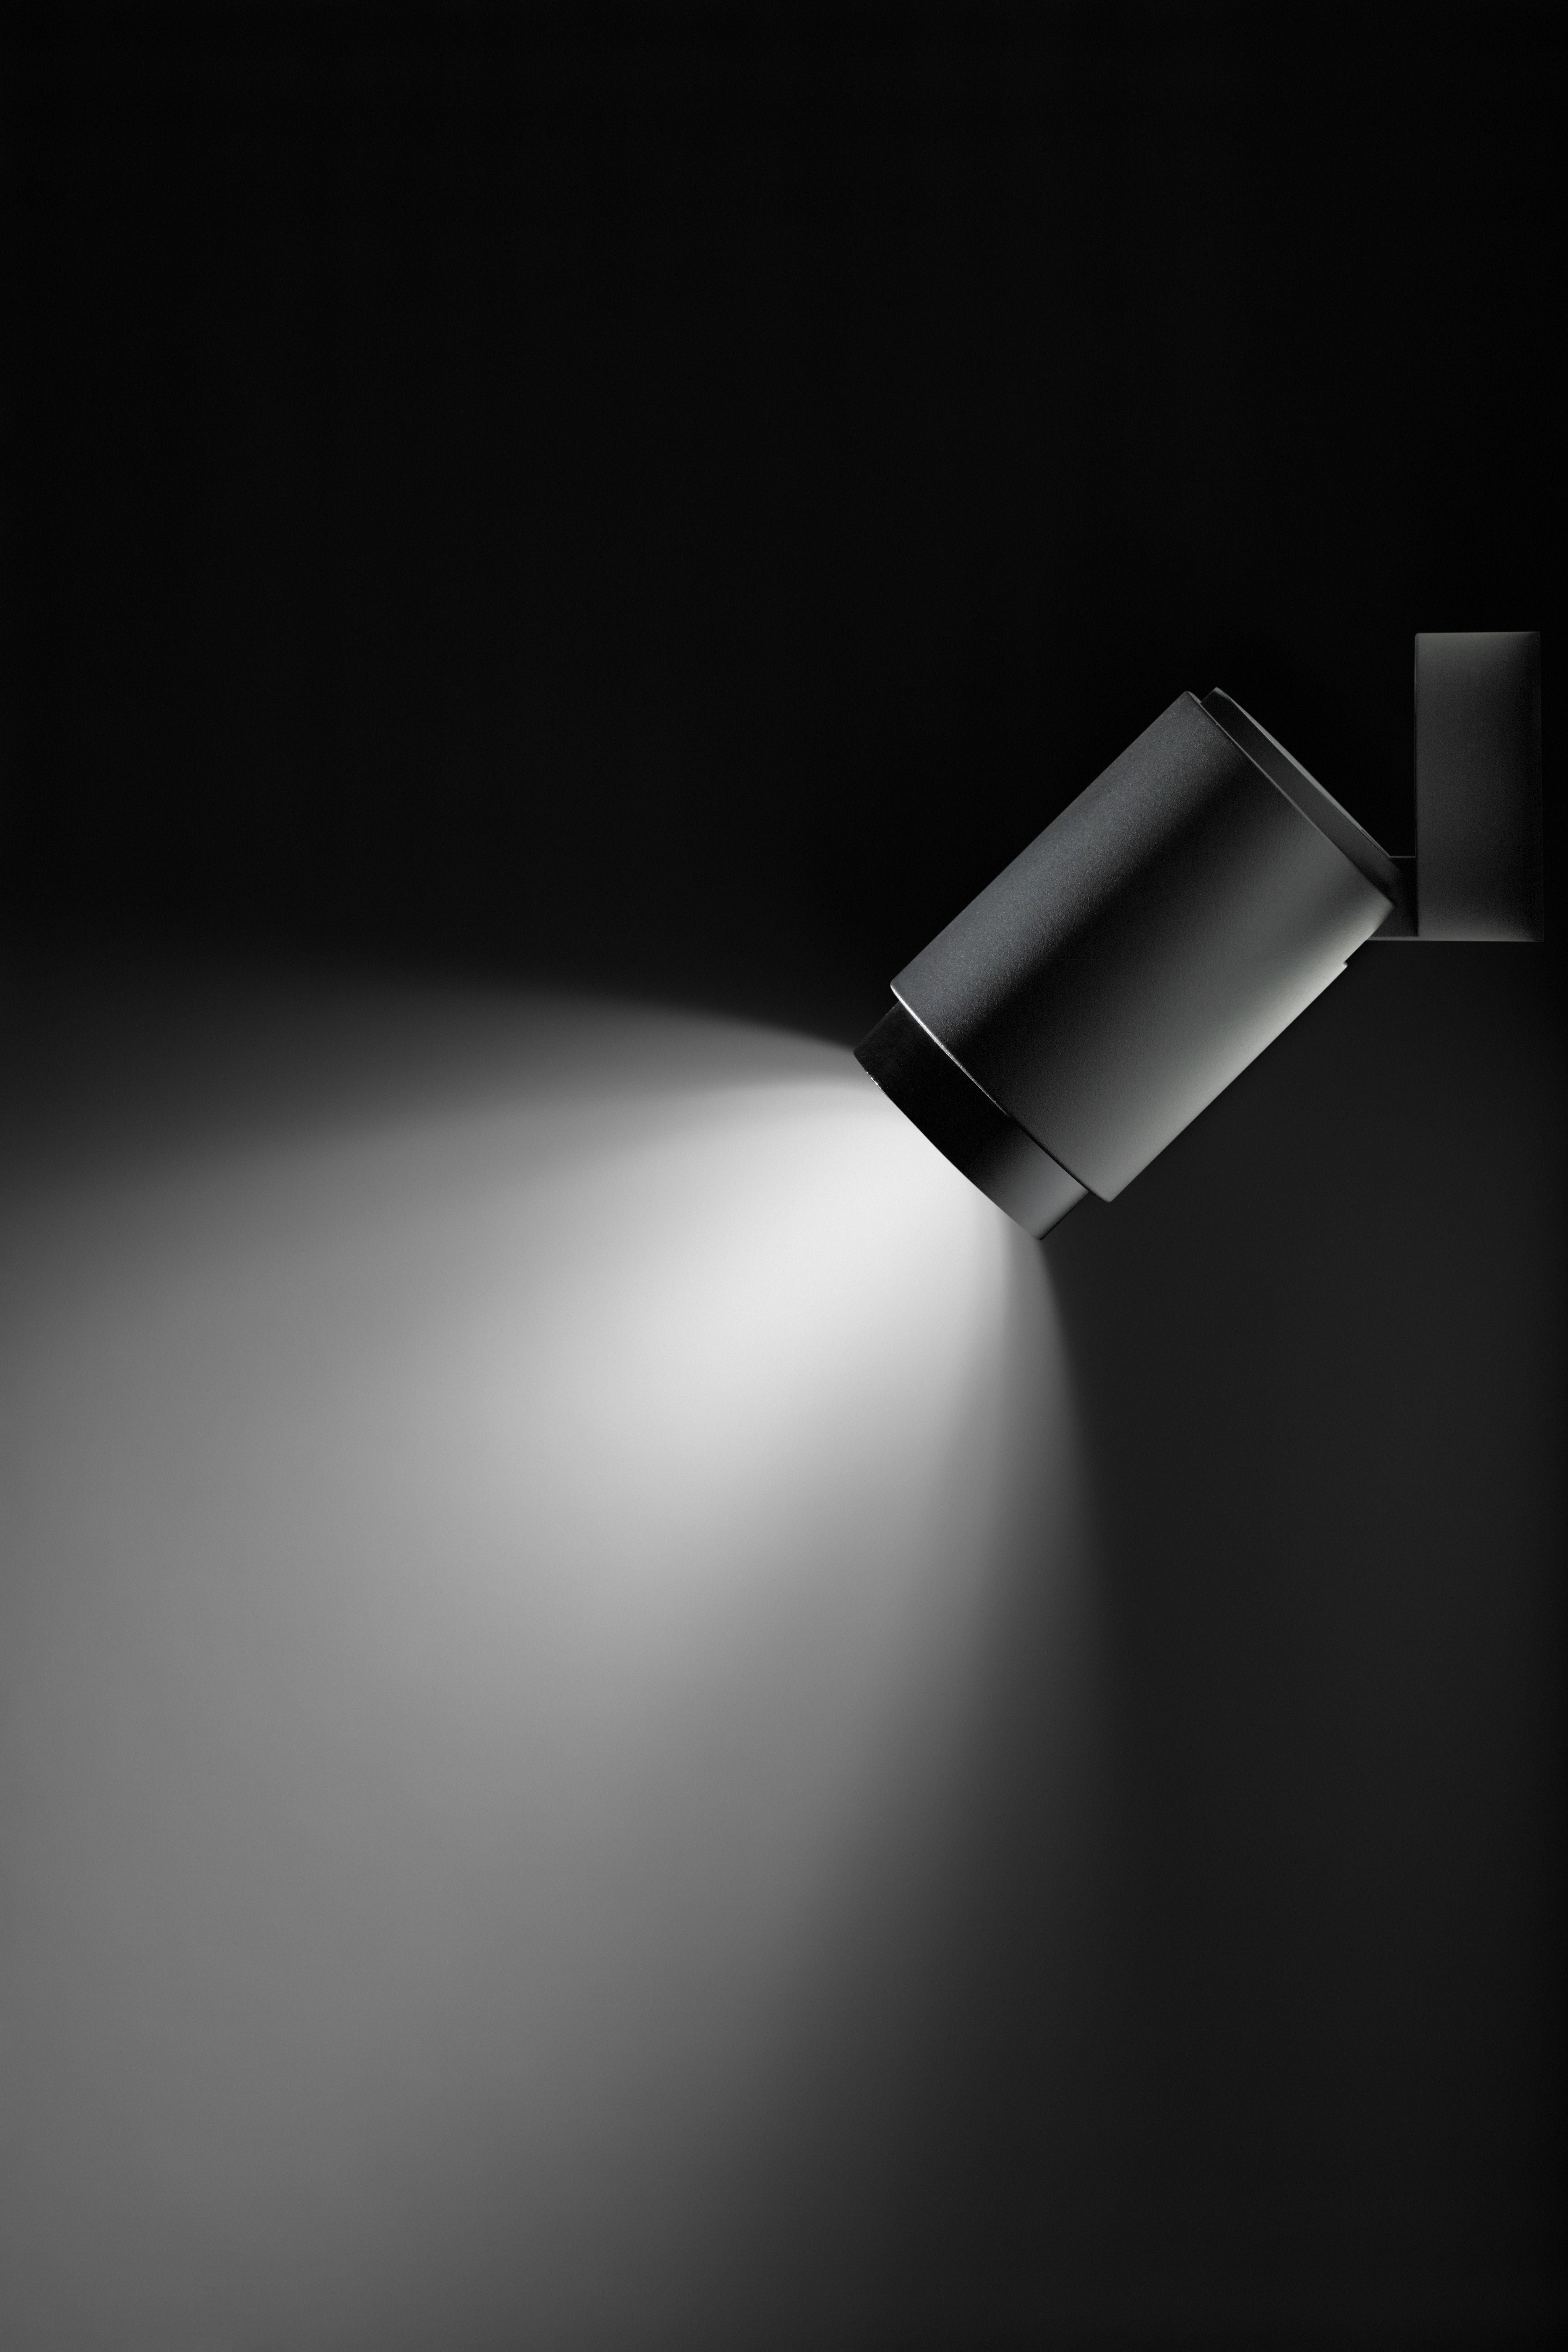 Gira Plug Light Alles Infos Findest Du Auf Gira De Lampen Wohnzimmer Decke Esszimmer Ideen In Mit Bildern Lampen Wohnzimmer Wohnzimmer Decke Lampen